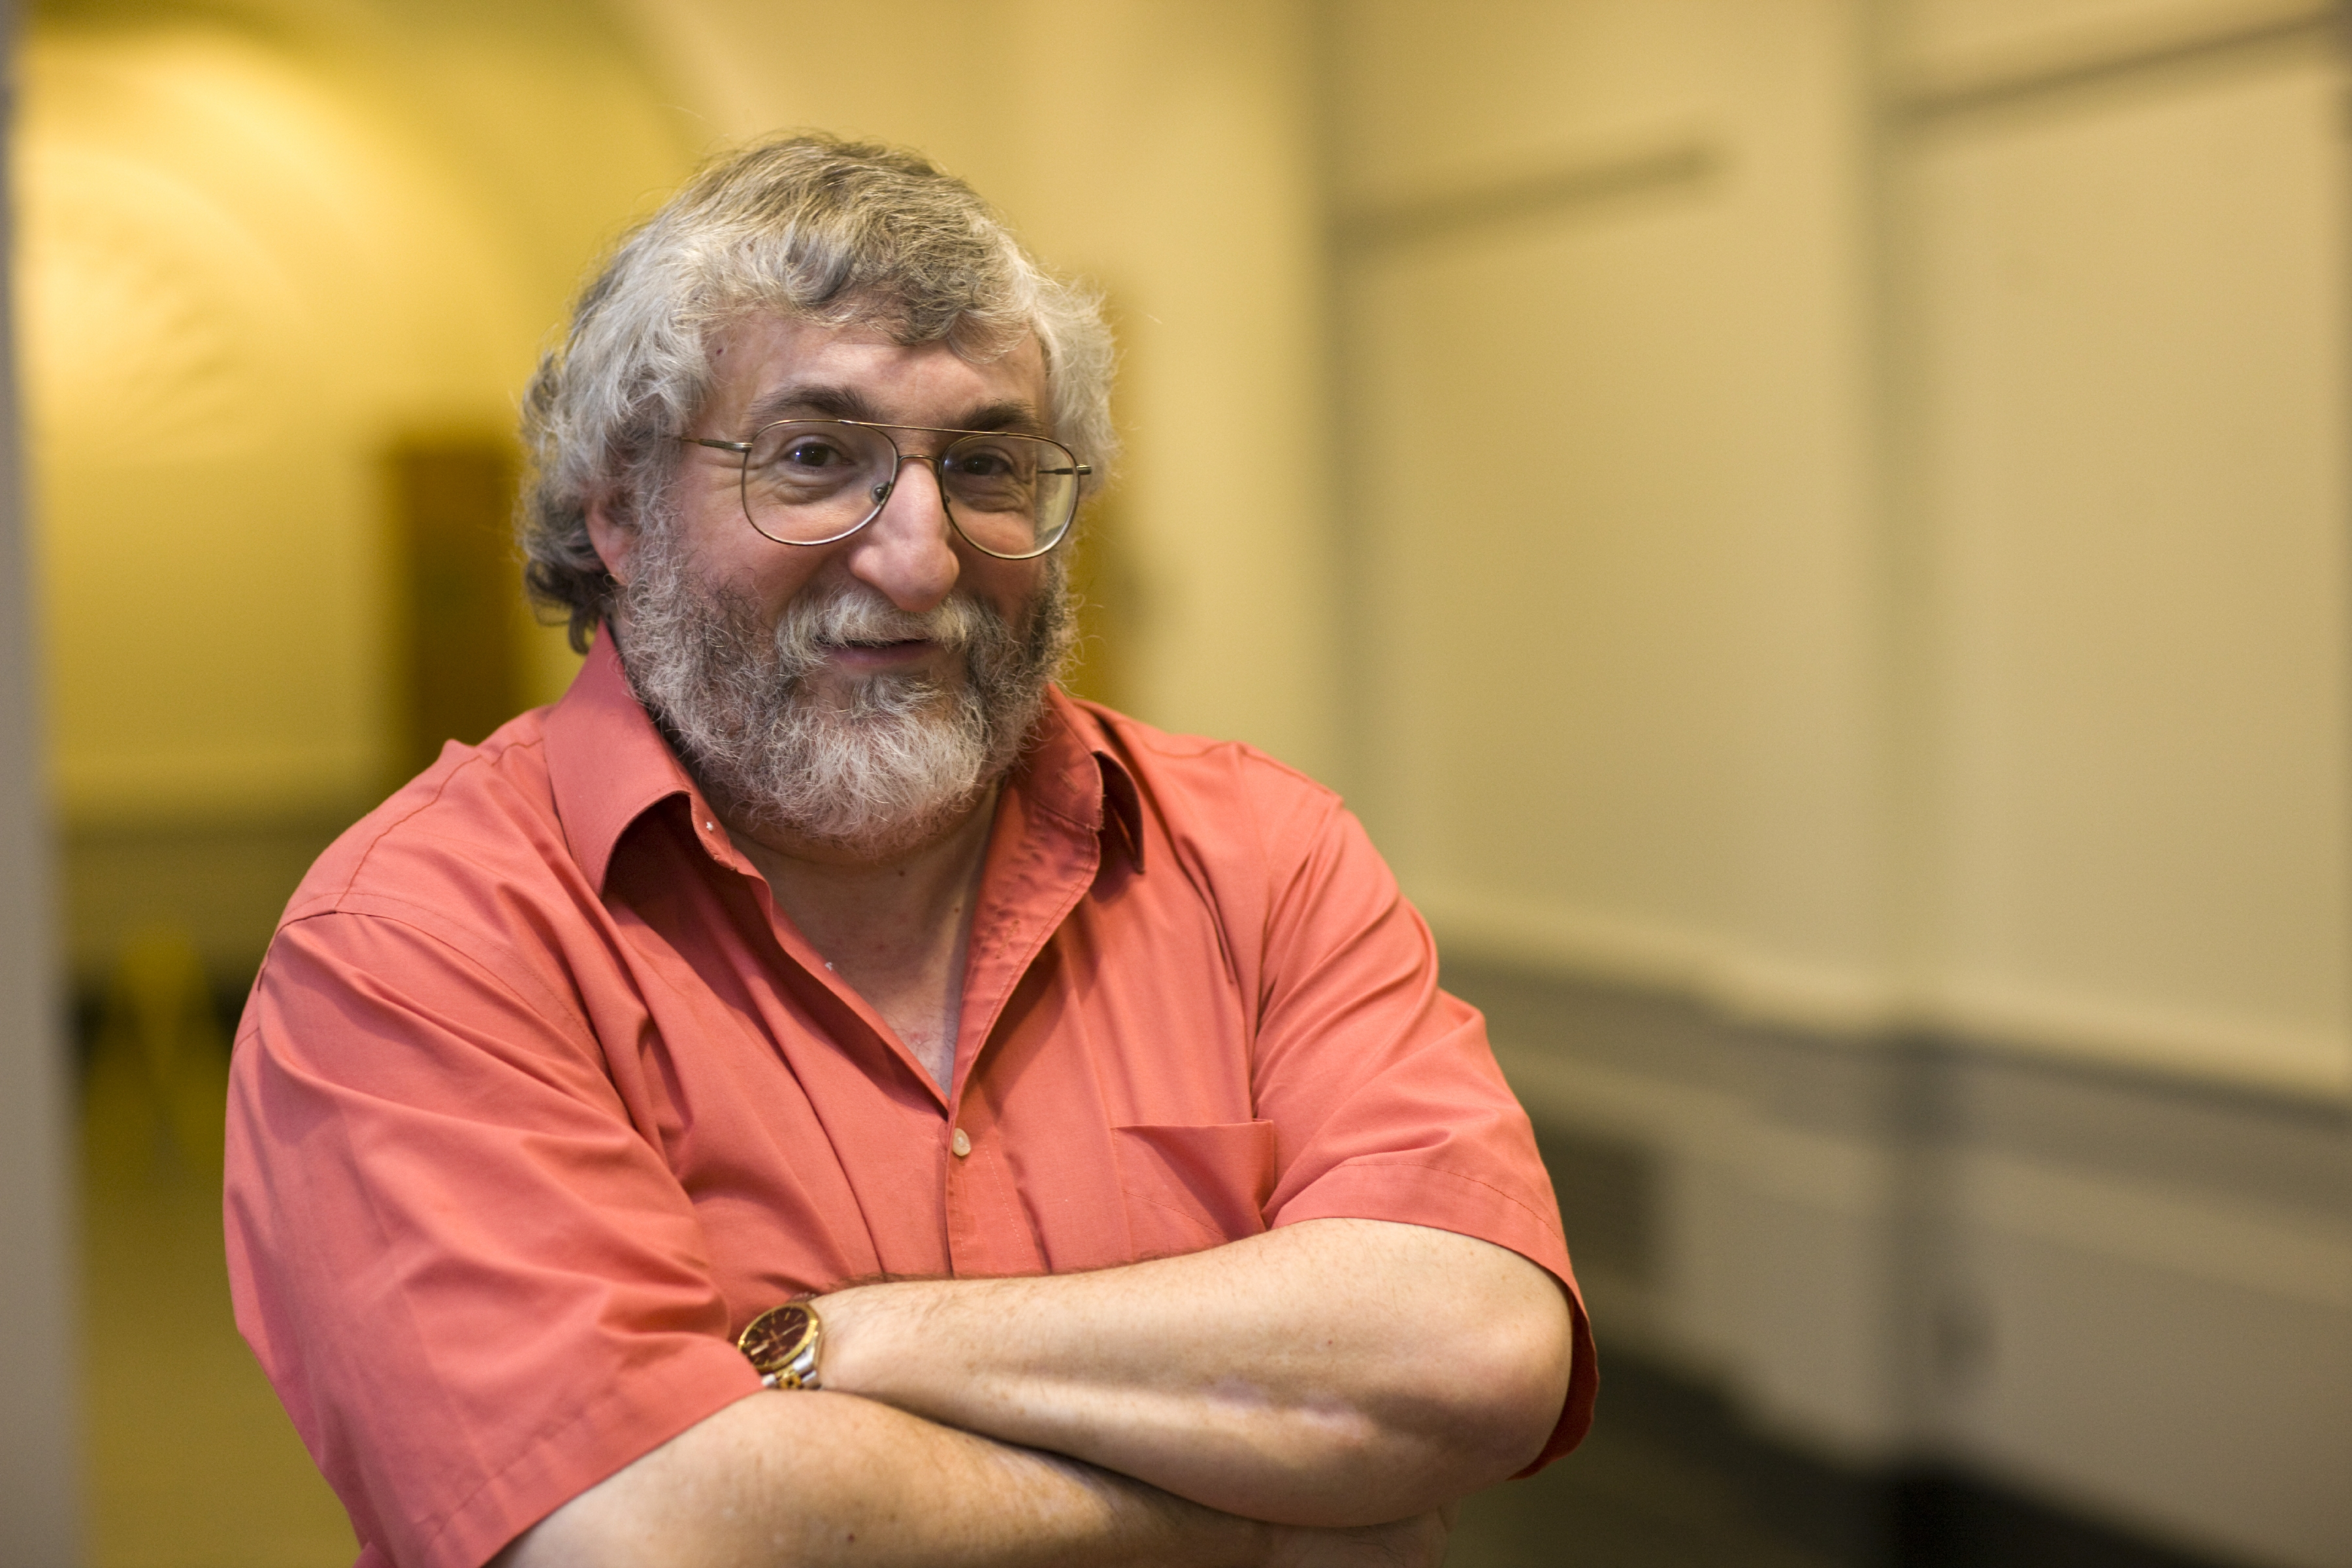 UVA economics professor Steven Stern worked with several collaborators to examine the impact of Virginia's vocational rehabilitation program. (Photo by Dan Addison, University Communications